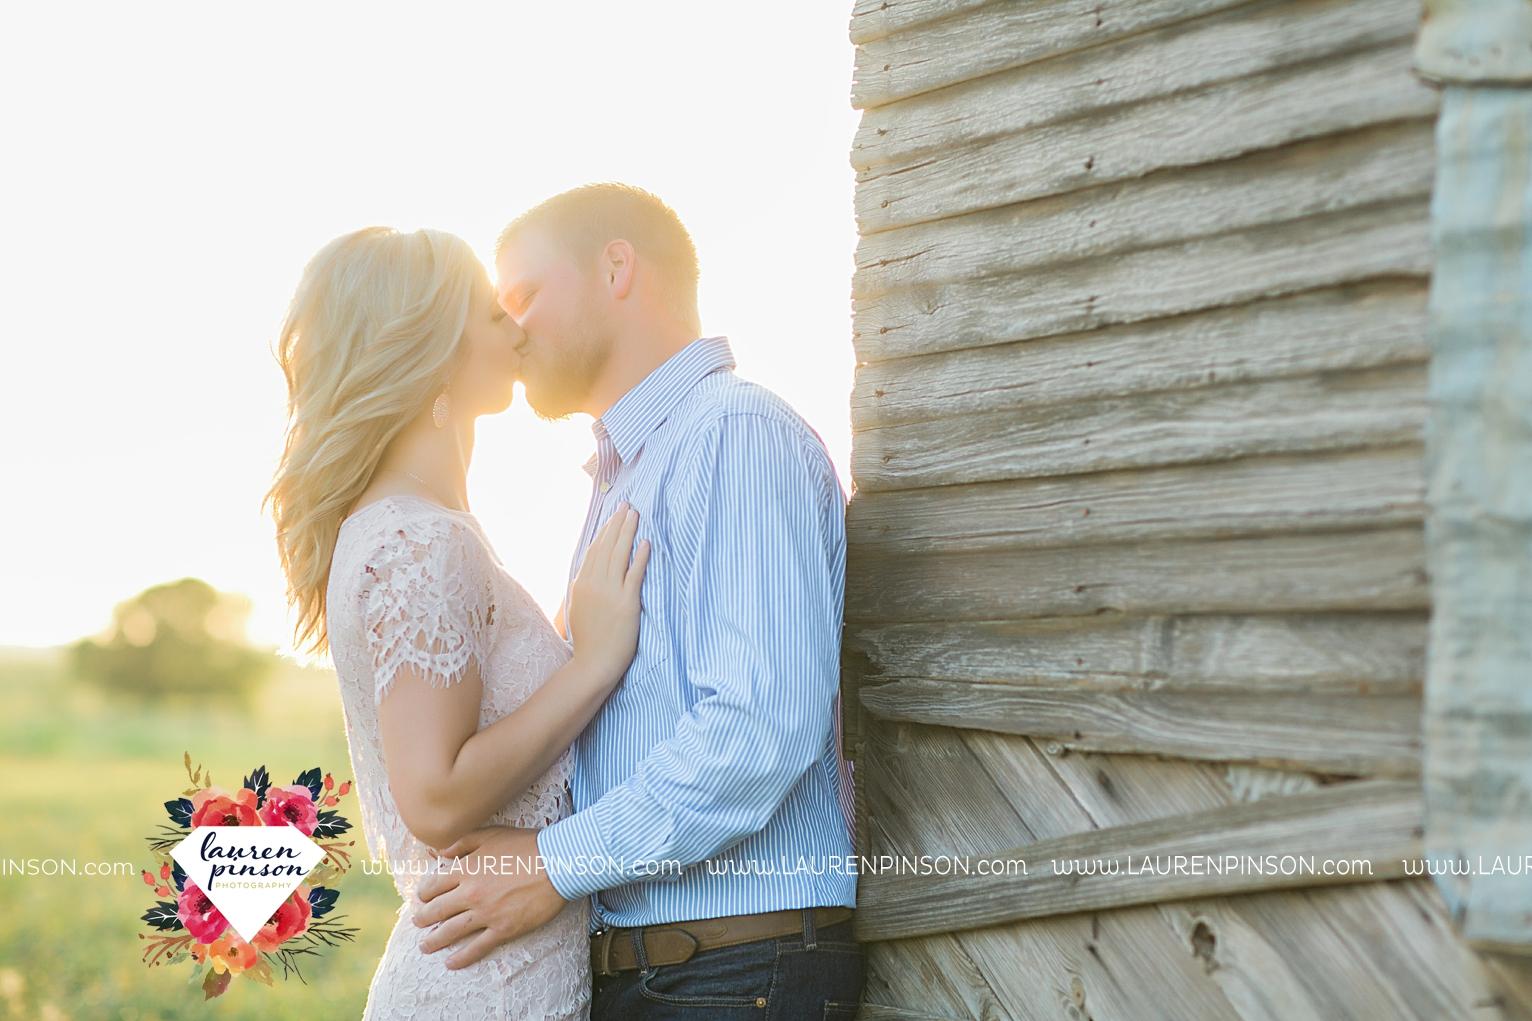 wichita-falls-texas-wedding-photographer-scotland-texas-engagement-session-country-barn-field-windthorst_2753.jpg